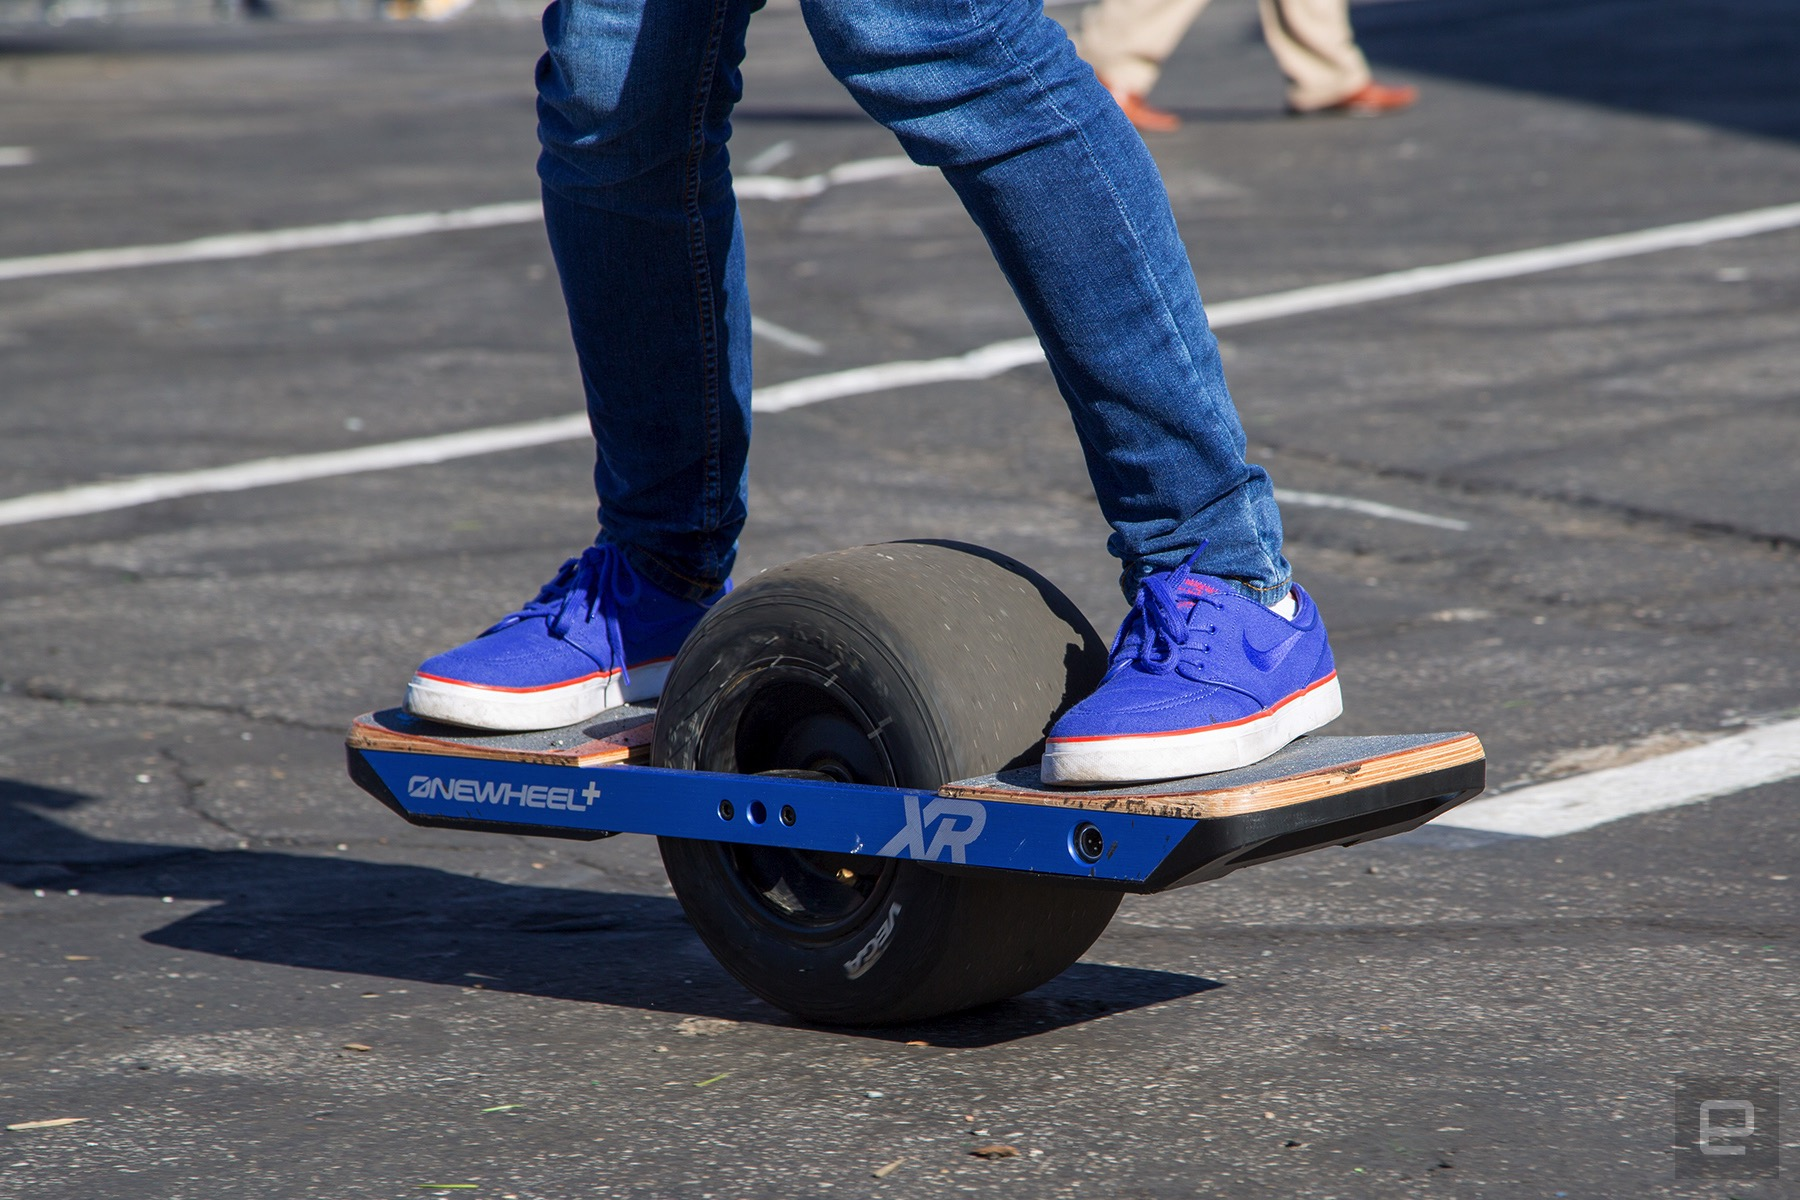 Cruising around on the Onewheel+ XR